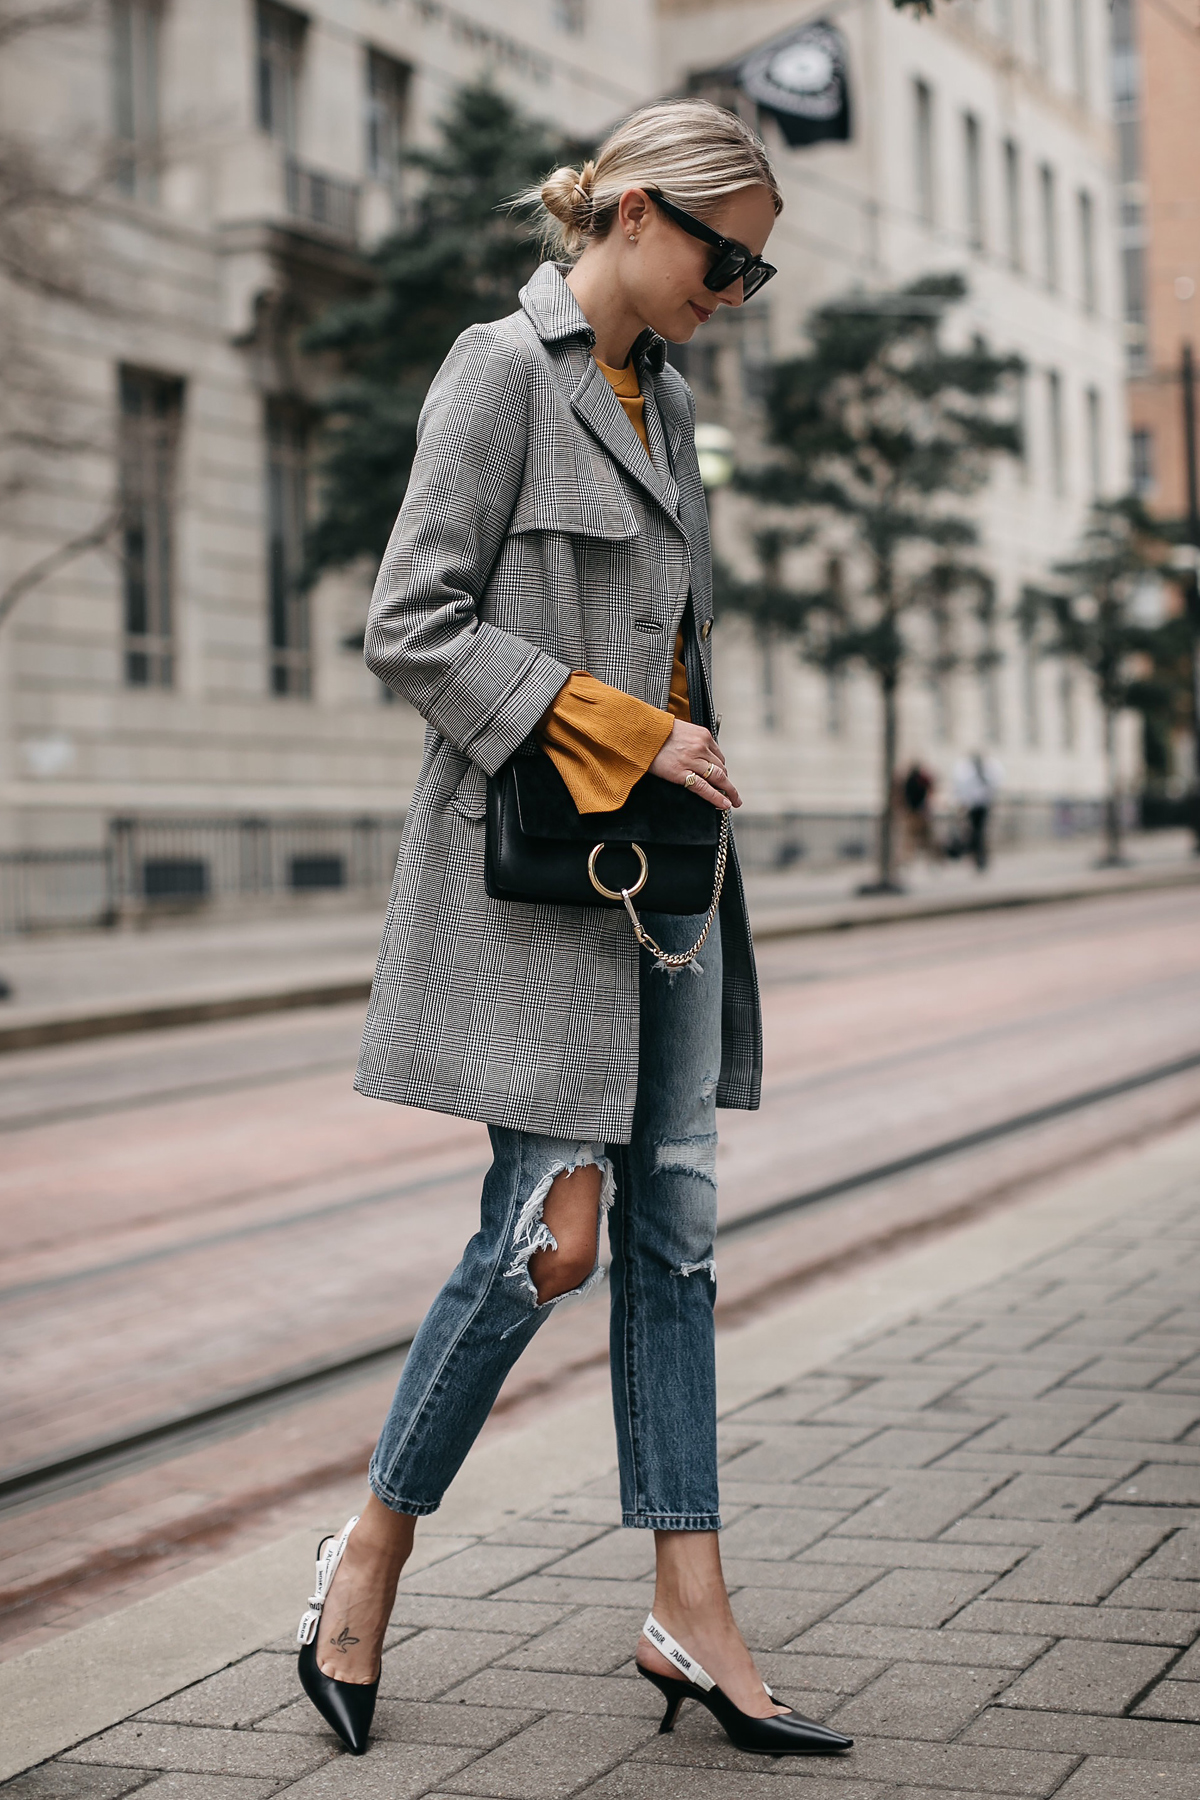 My favorite fashion blog